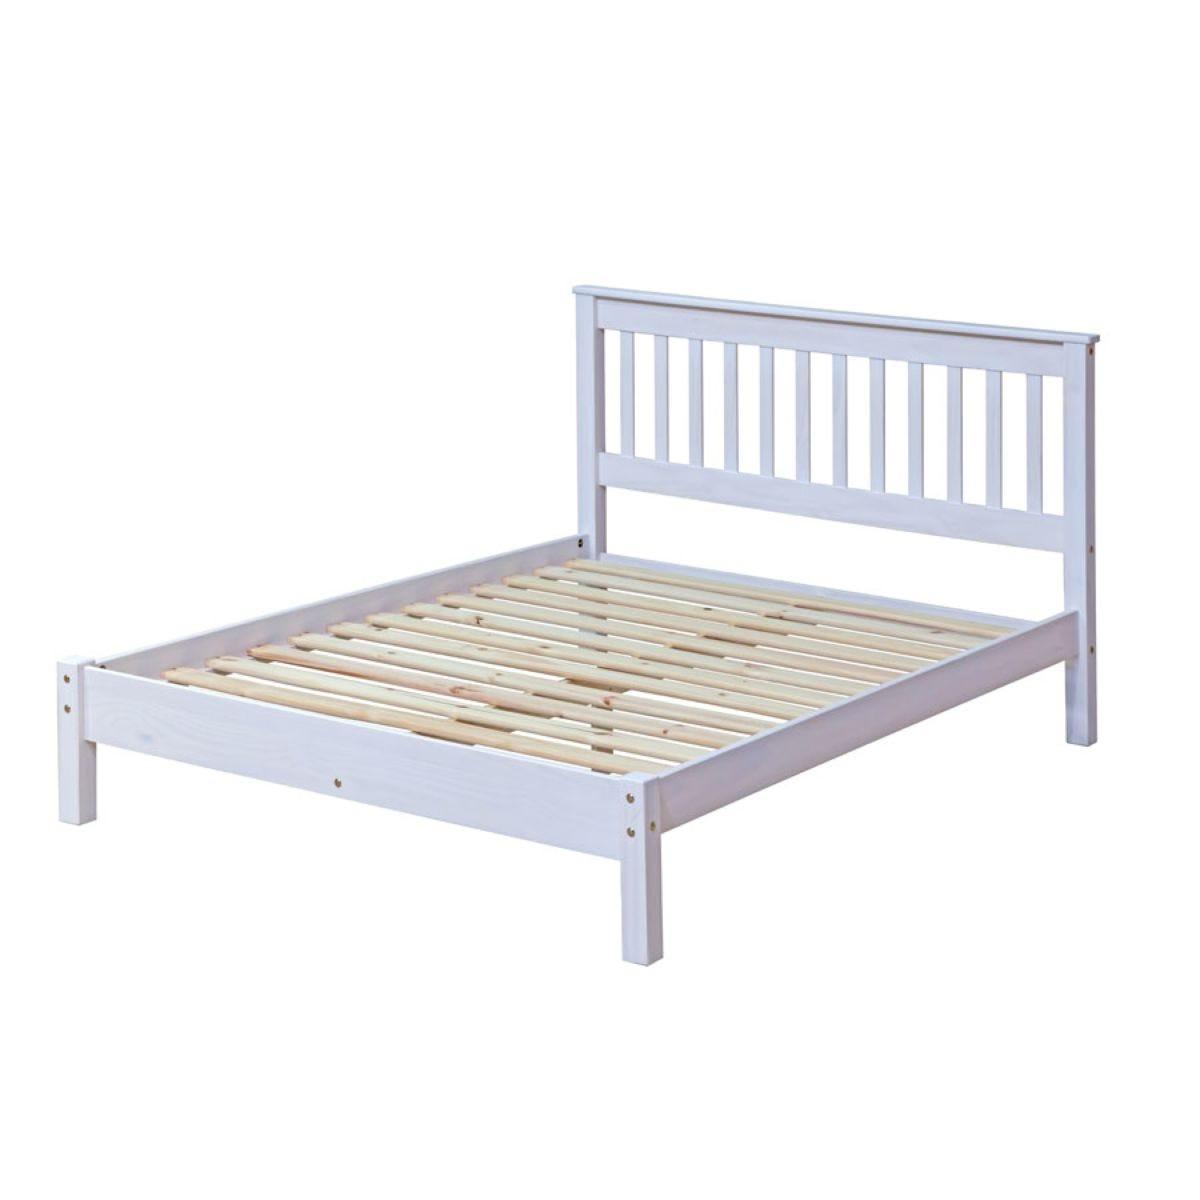 Halea Pine 4'6'' Double Bed - White